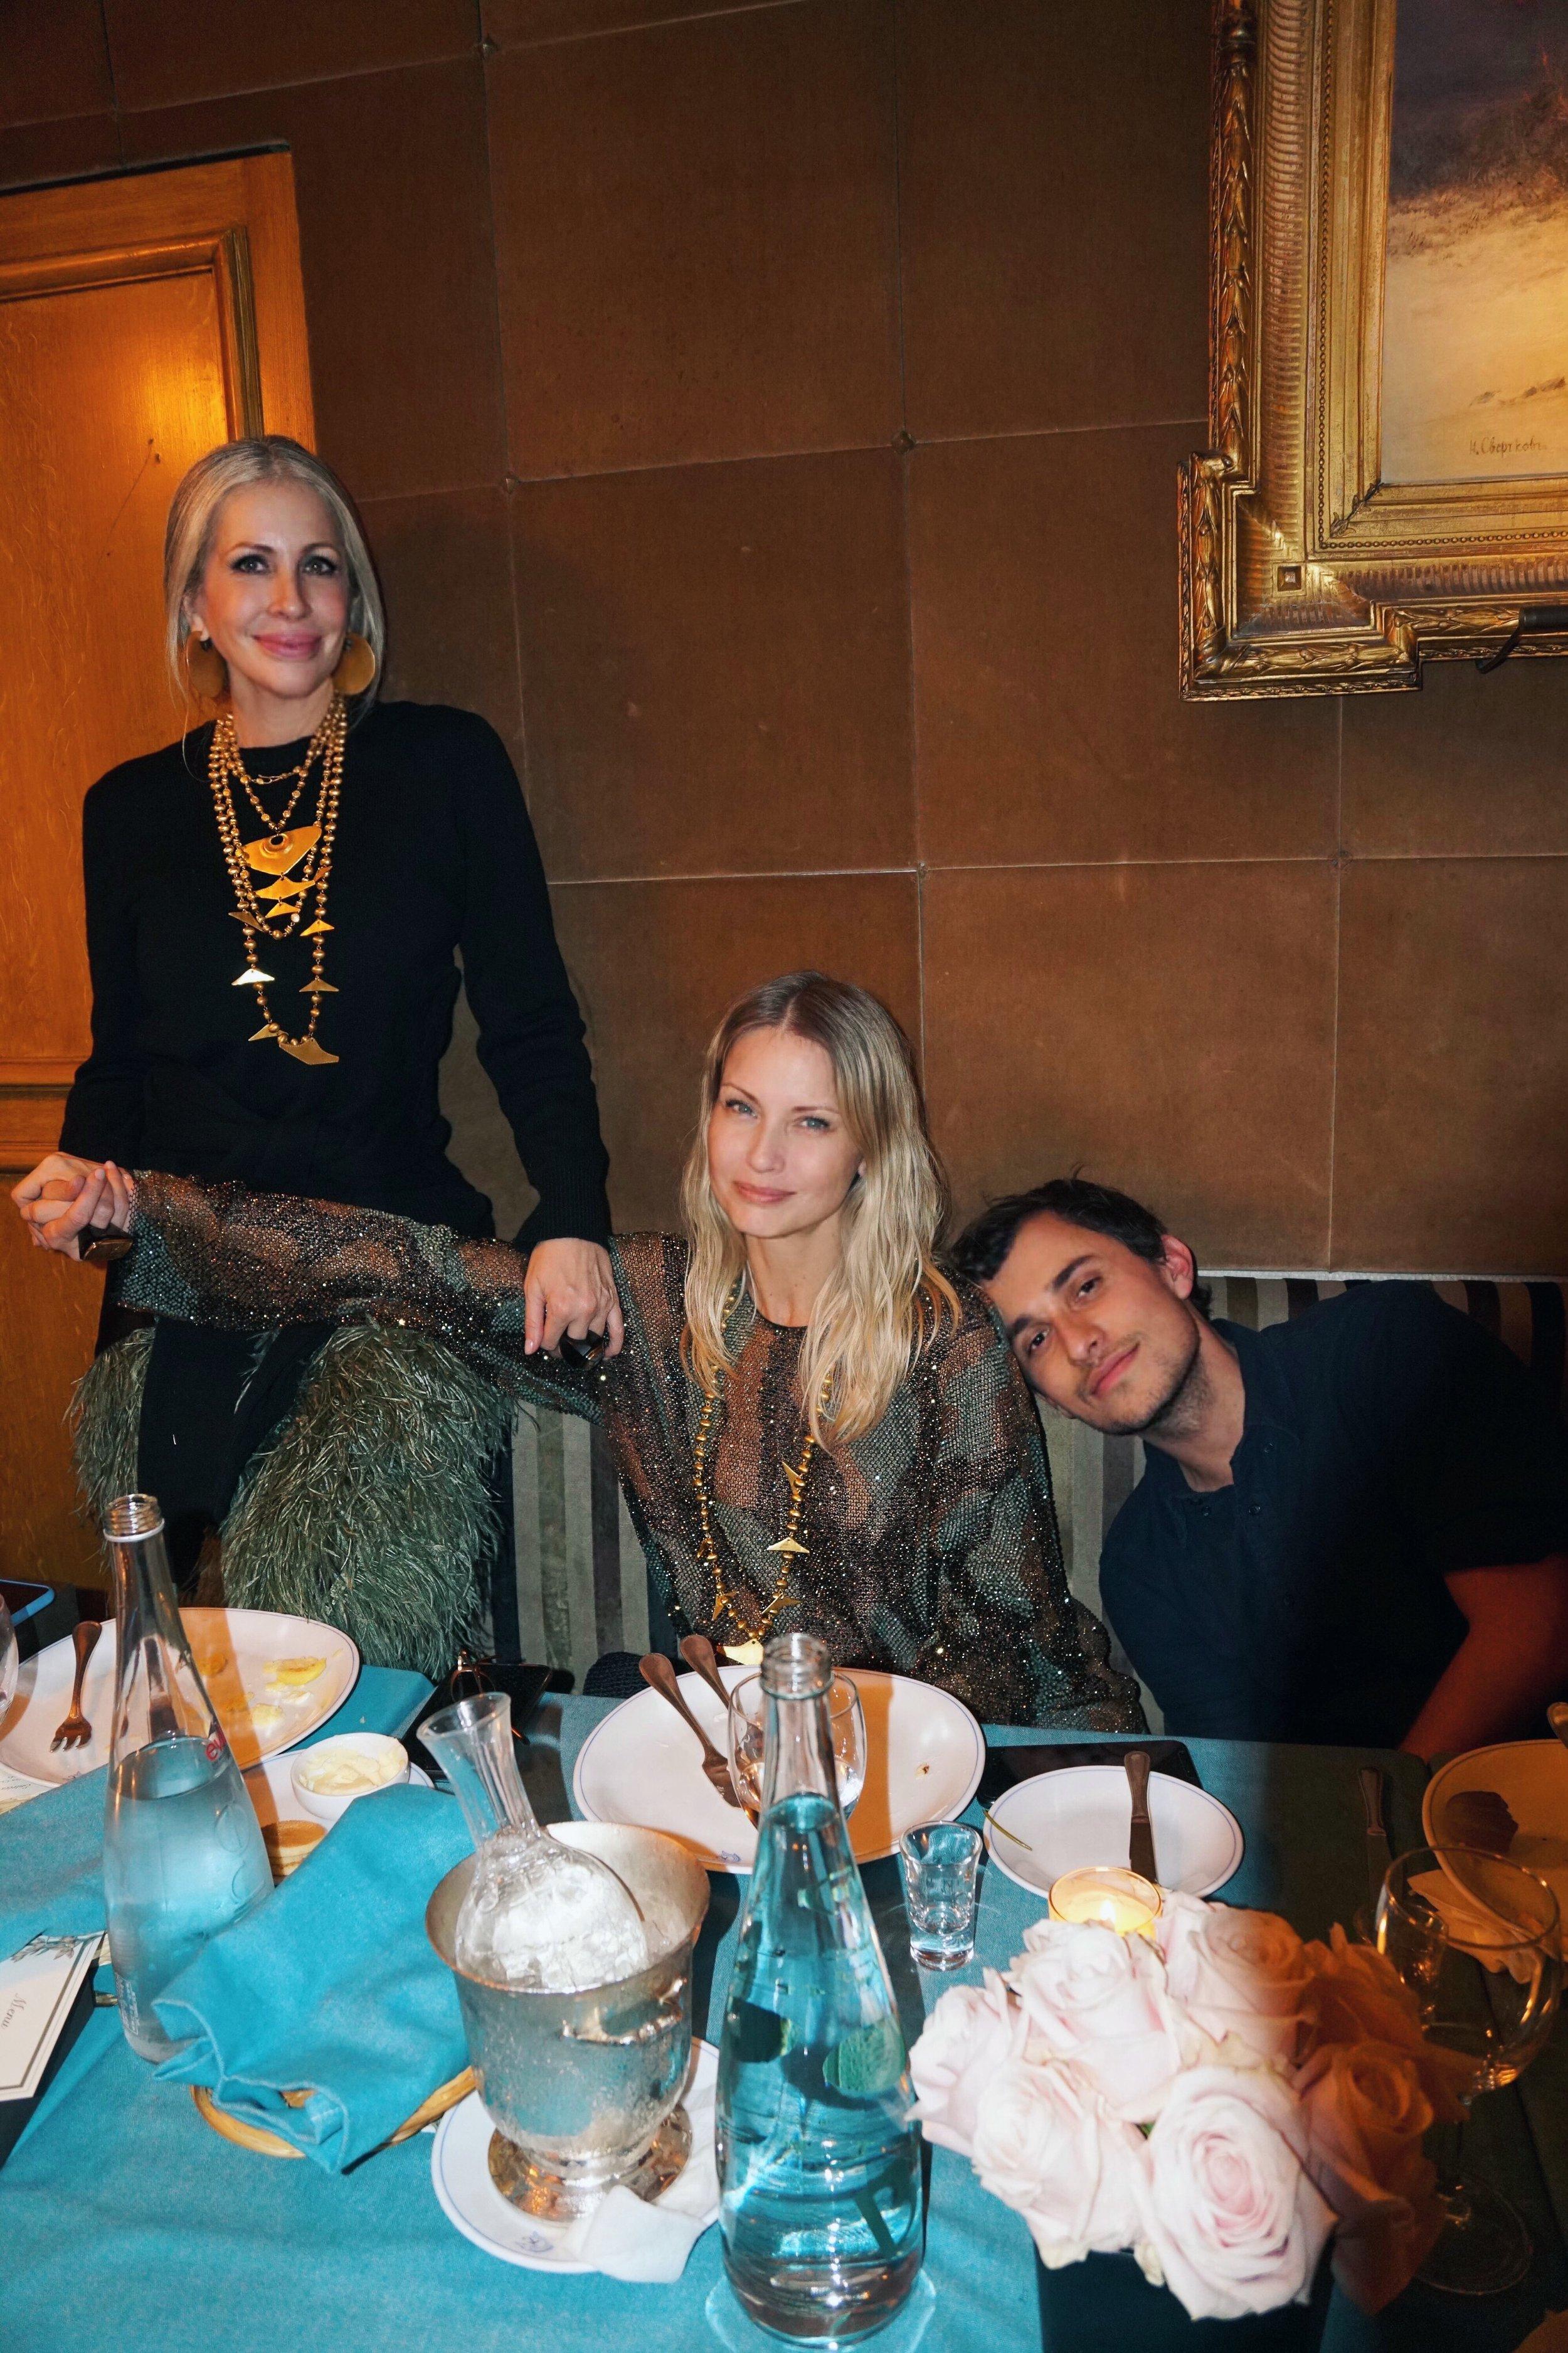 Carmen, Farfetch Chief Fashion Officer Holli Rogers, and designer Esteban Cortazar at Caviar Kaspia in Paris.